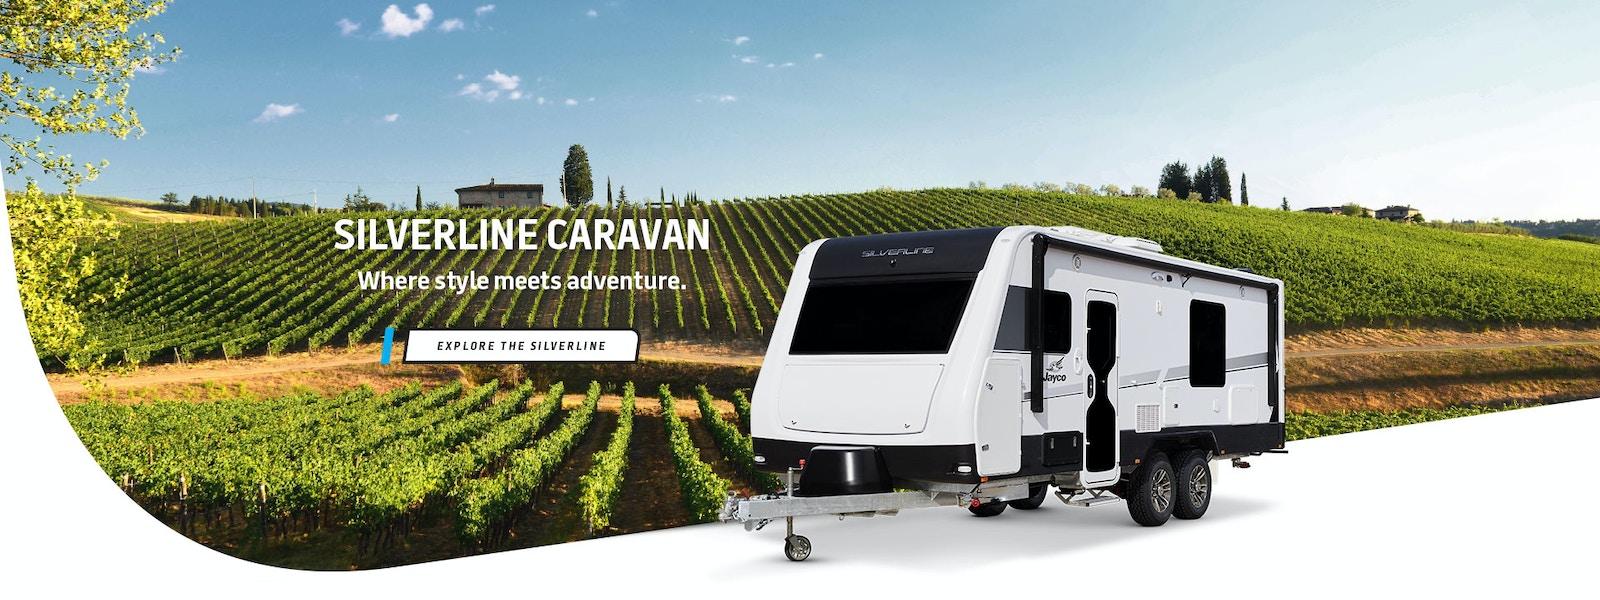 Silverline Caravans